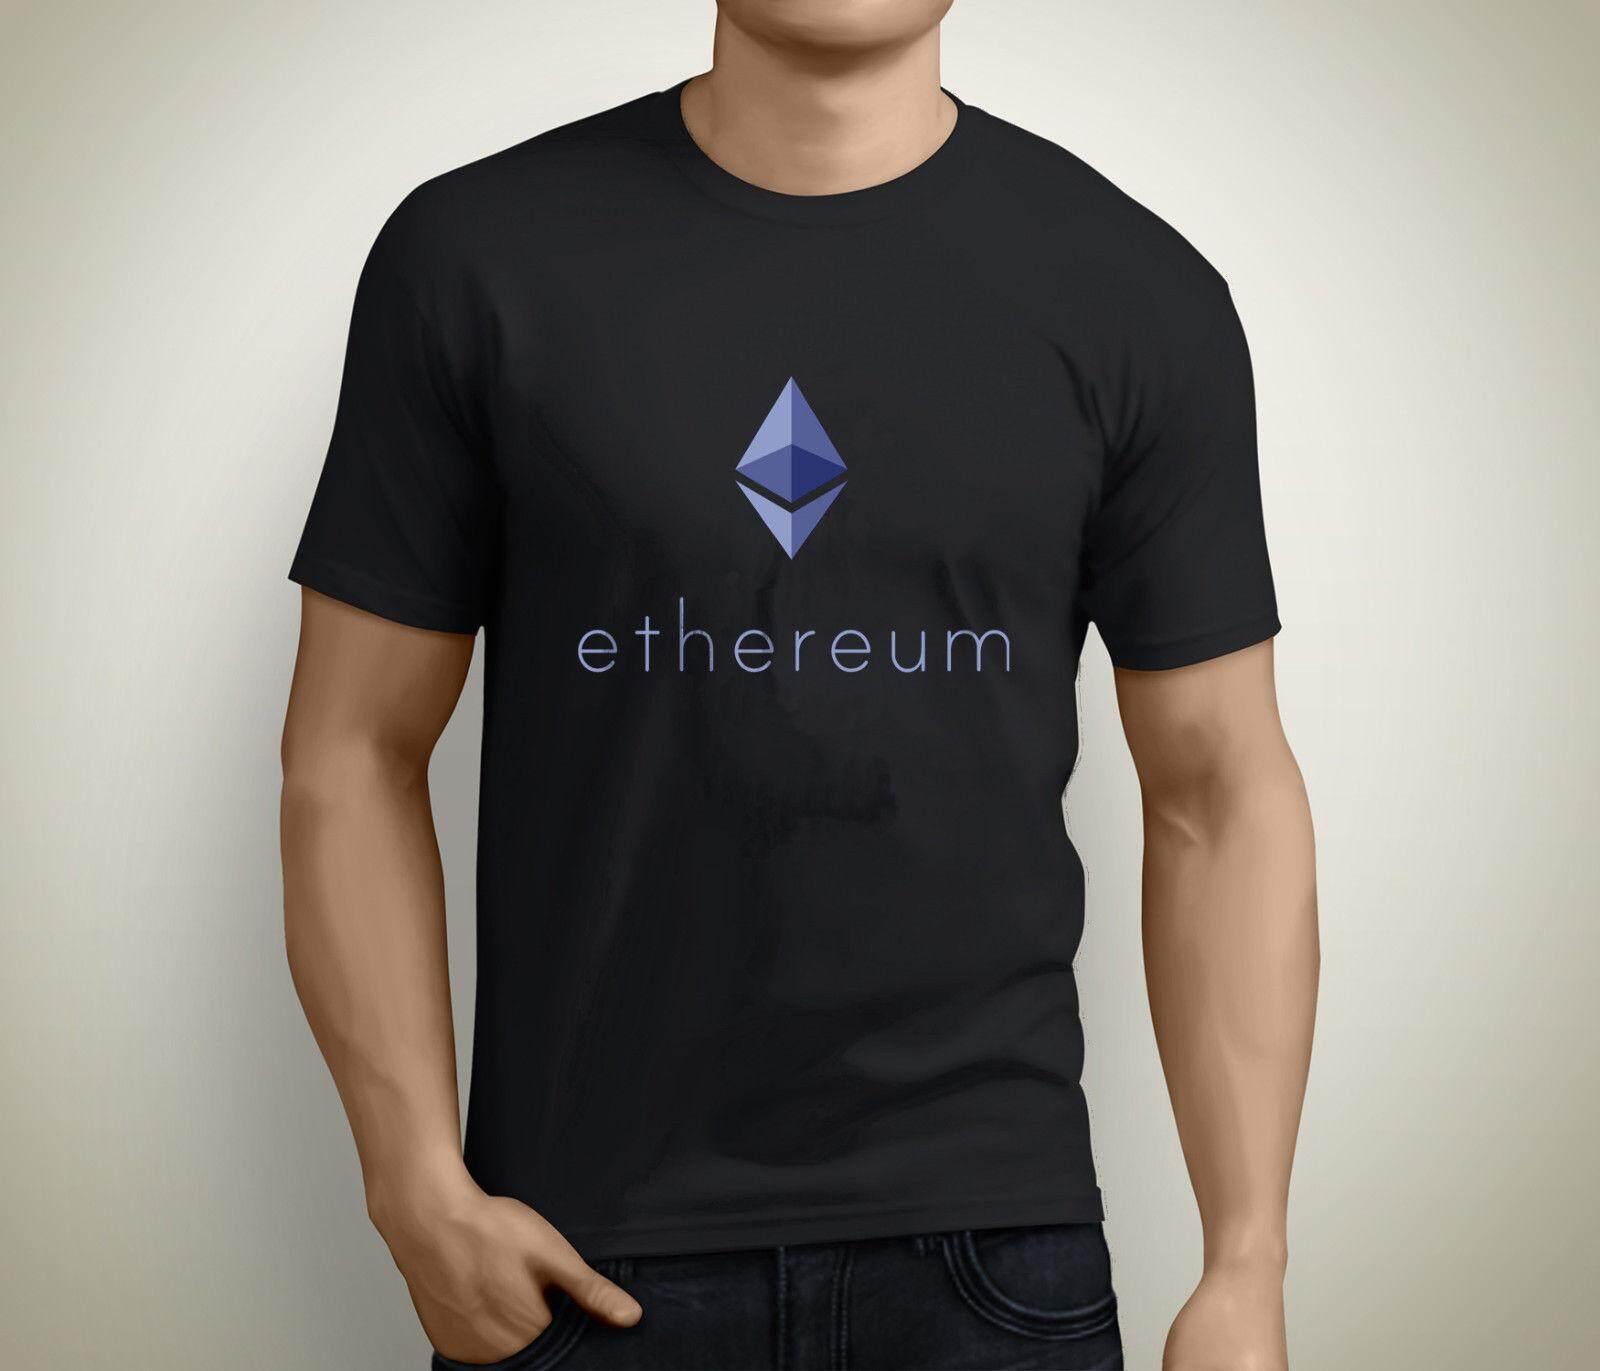 Ethereum Cotton T Shirts Men Short Sleeved Tshirt Man Tee Round Intl For Sale Online